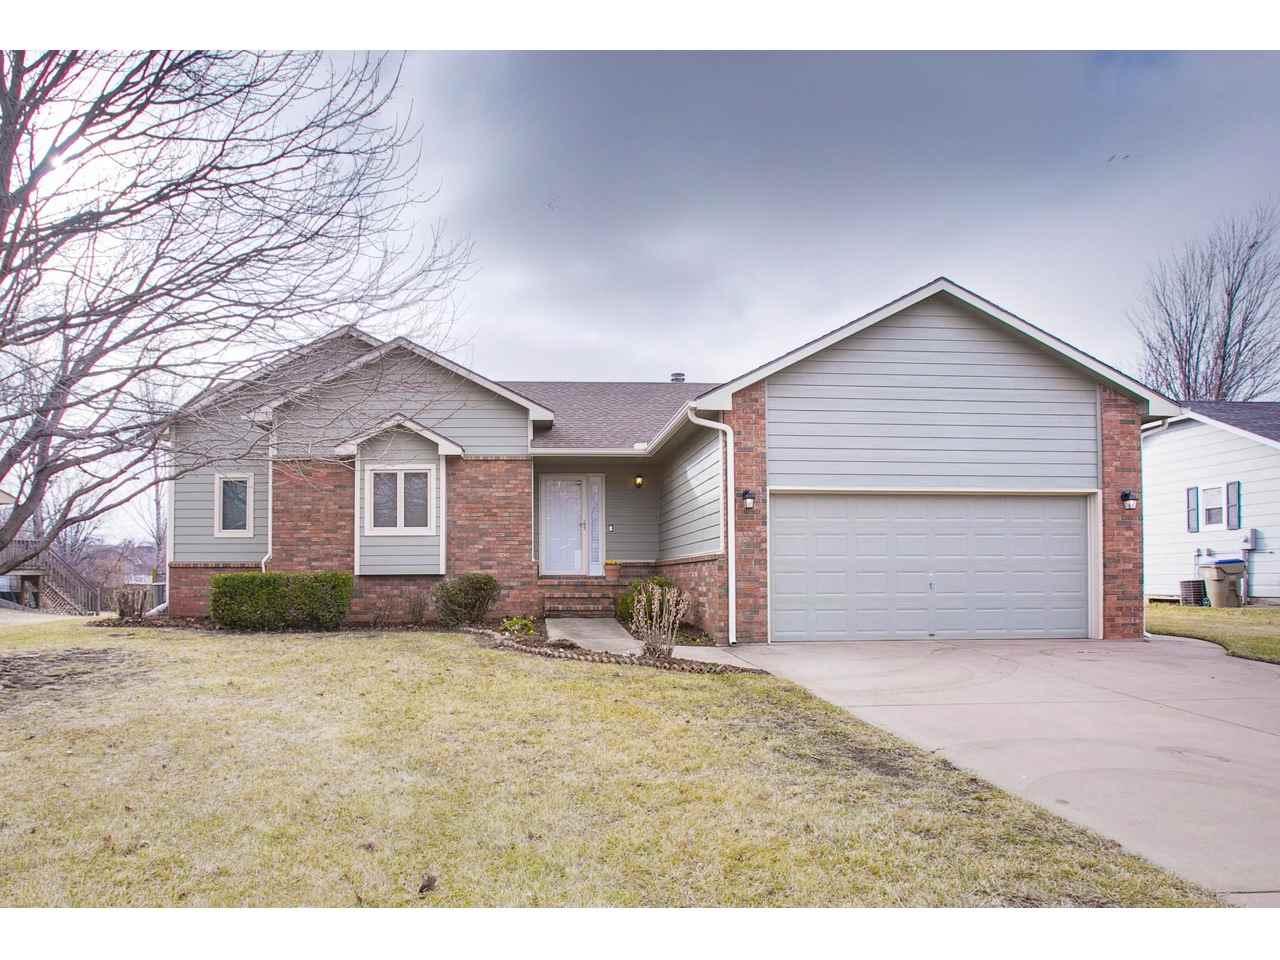 9701 W Britton St, Wichita, KS, 67205